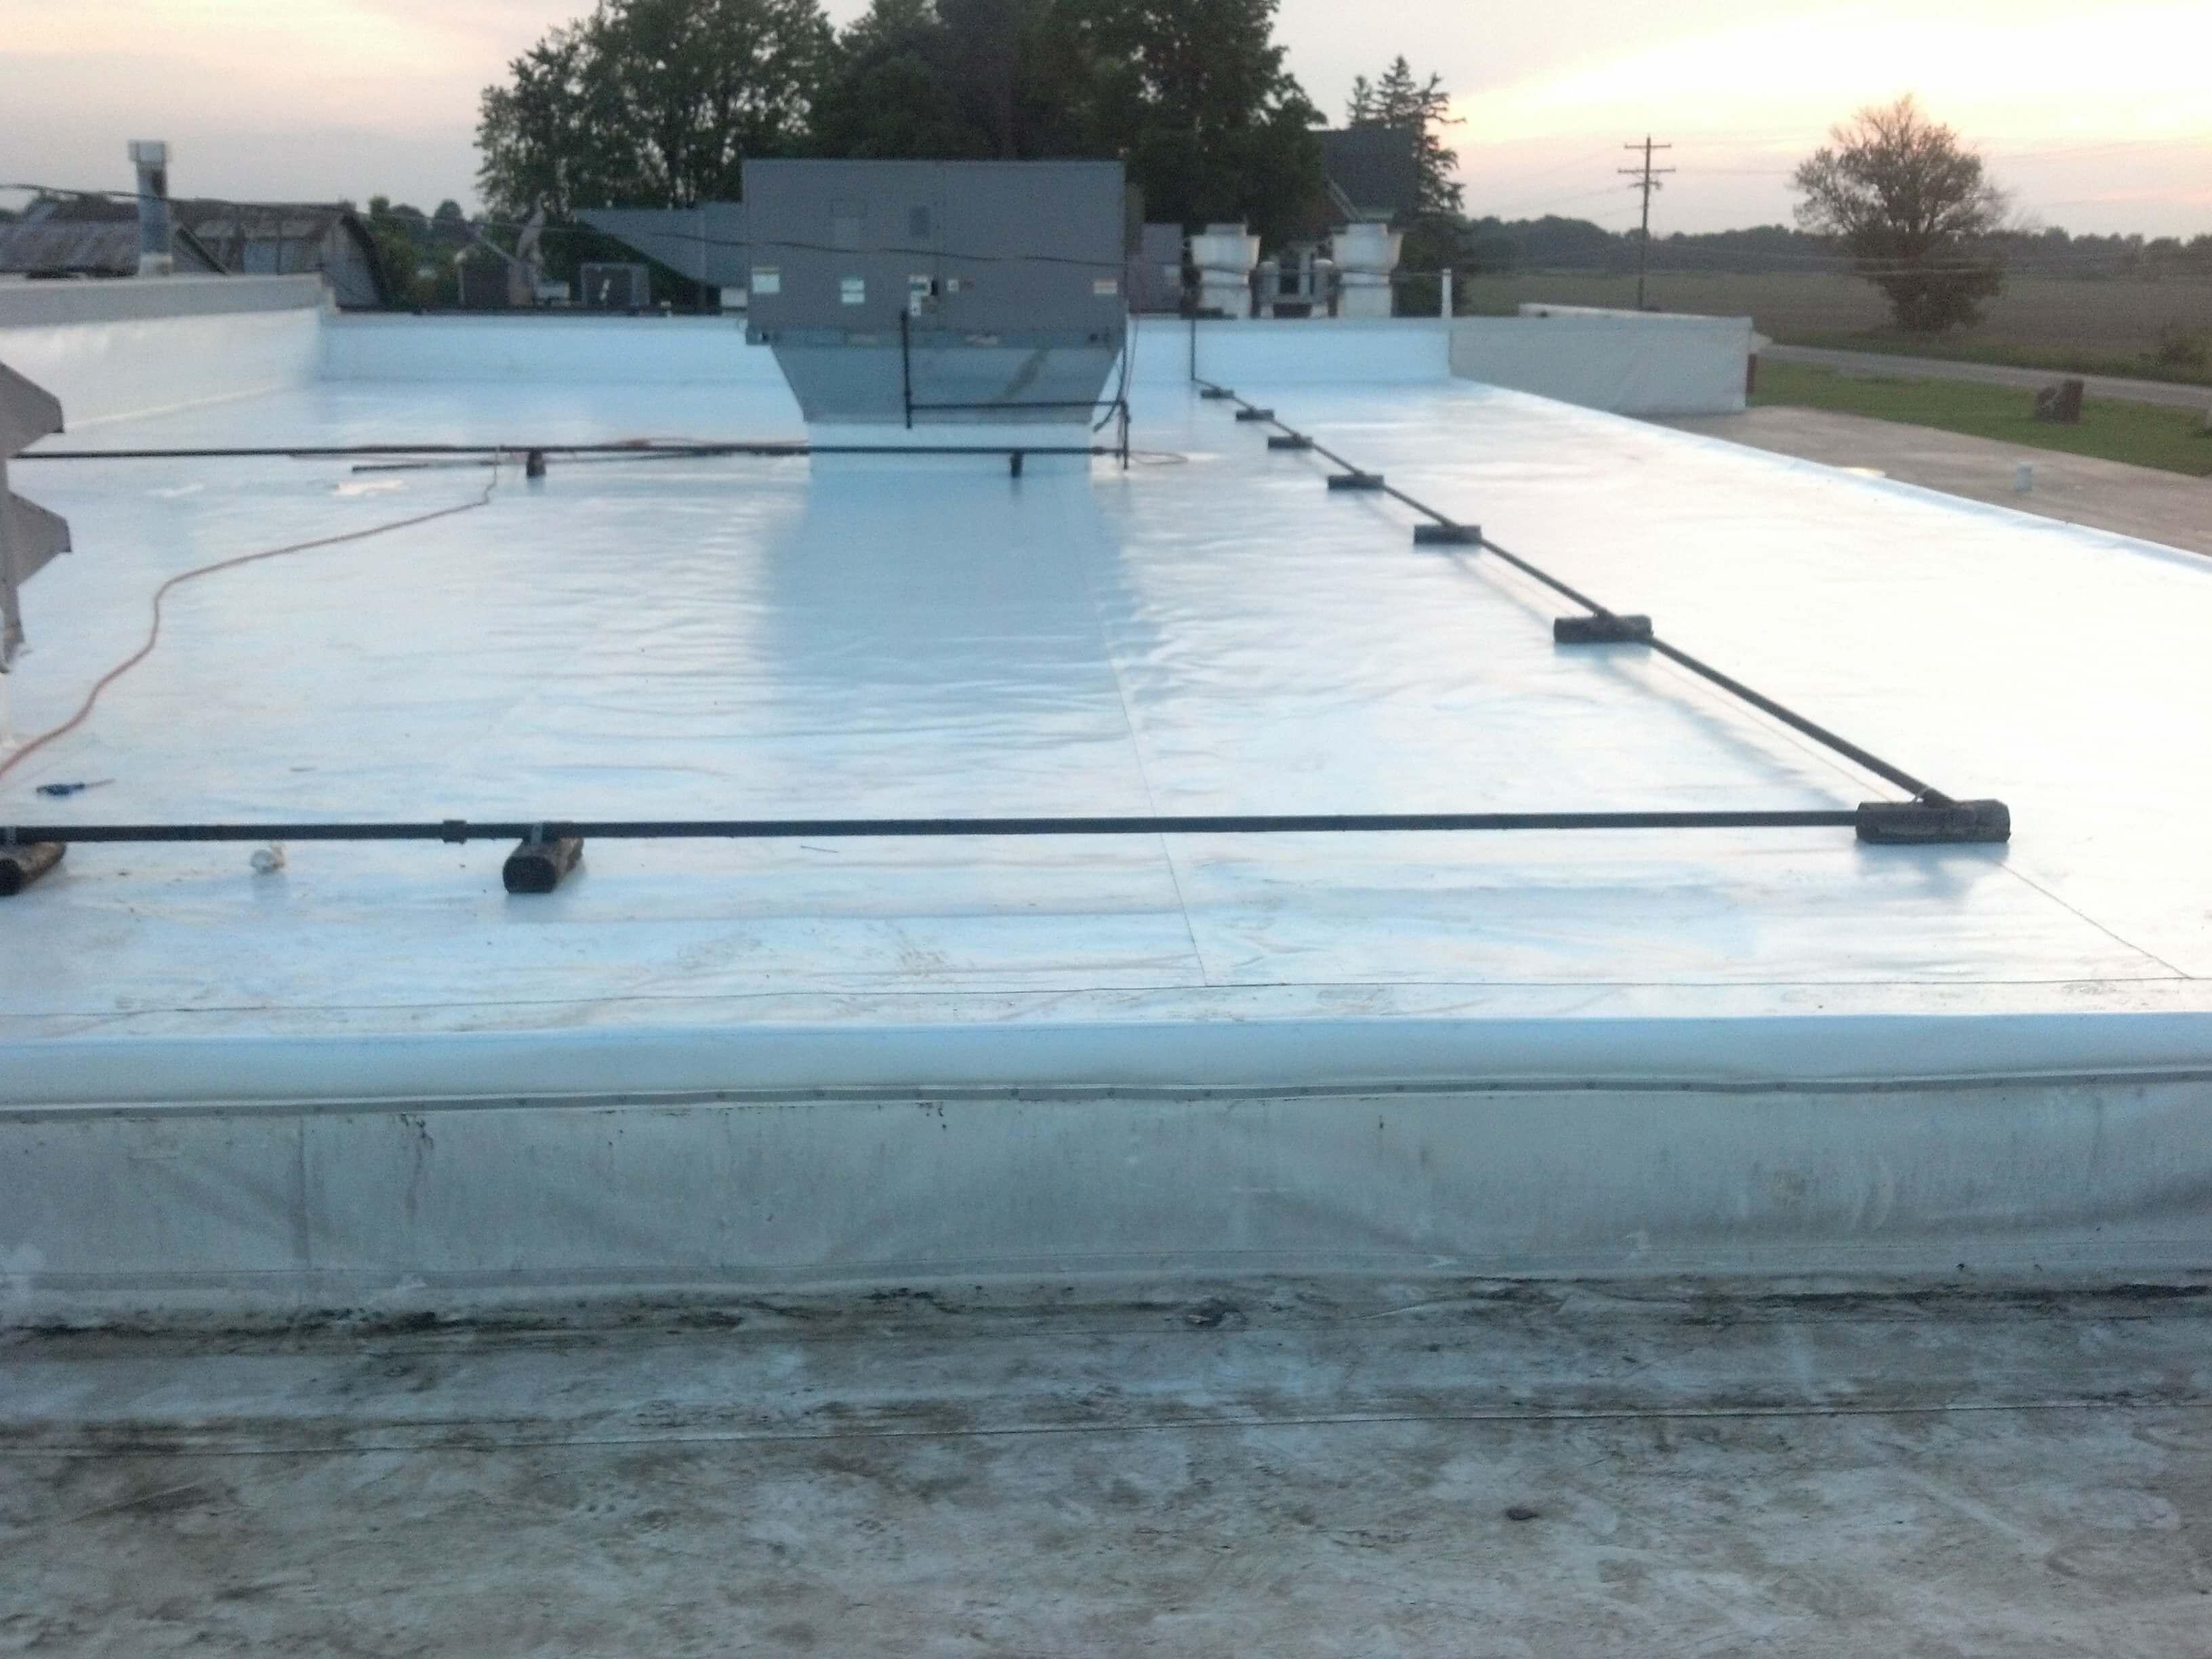 kansas city single ply roofing